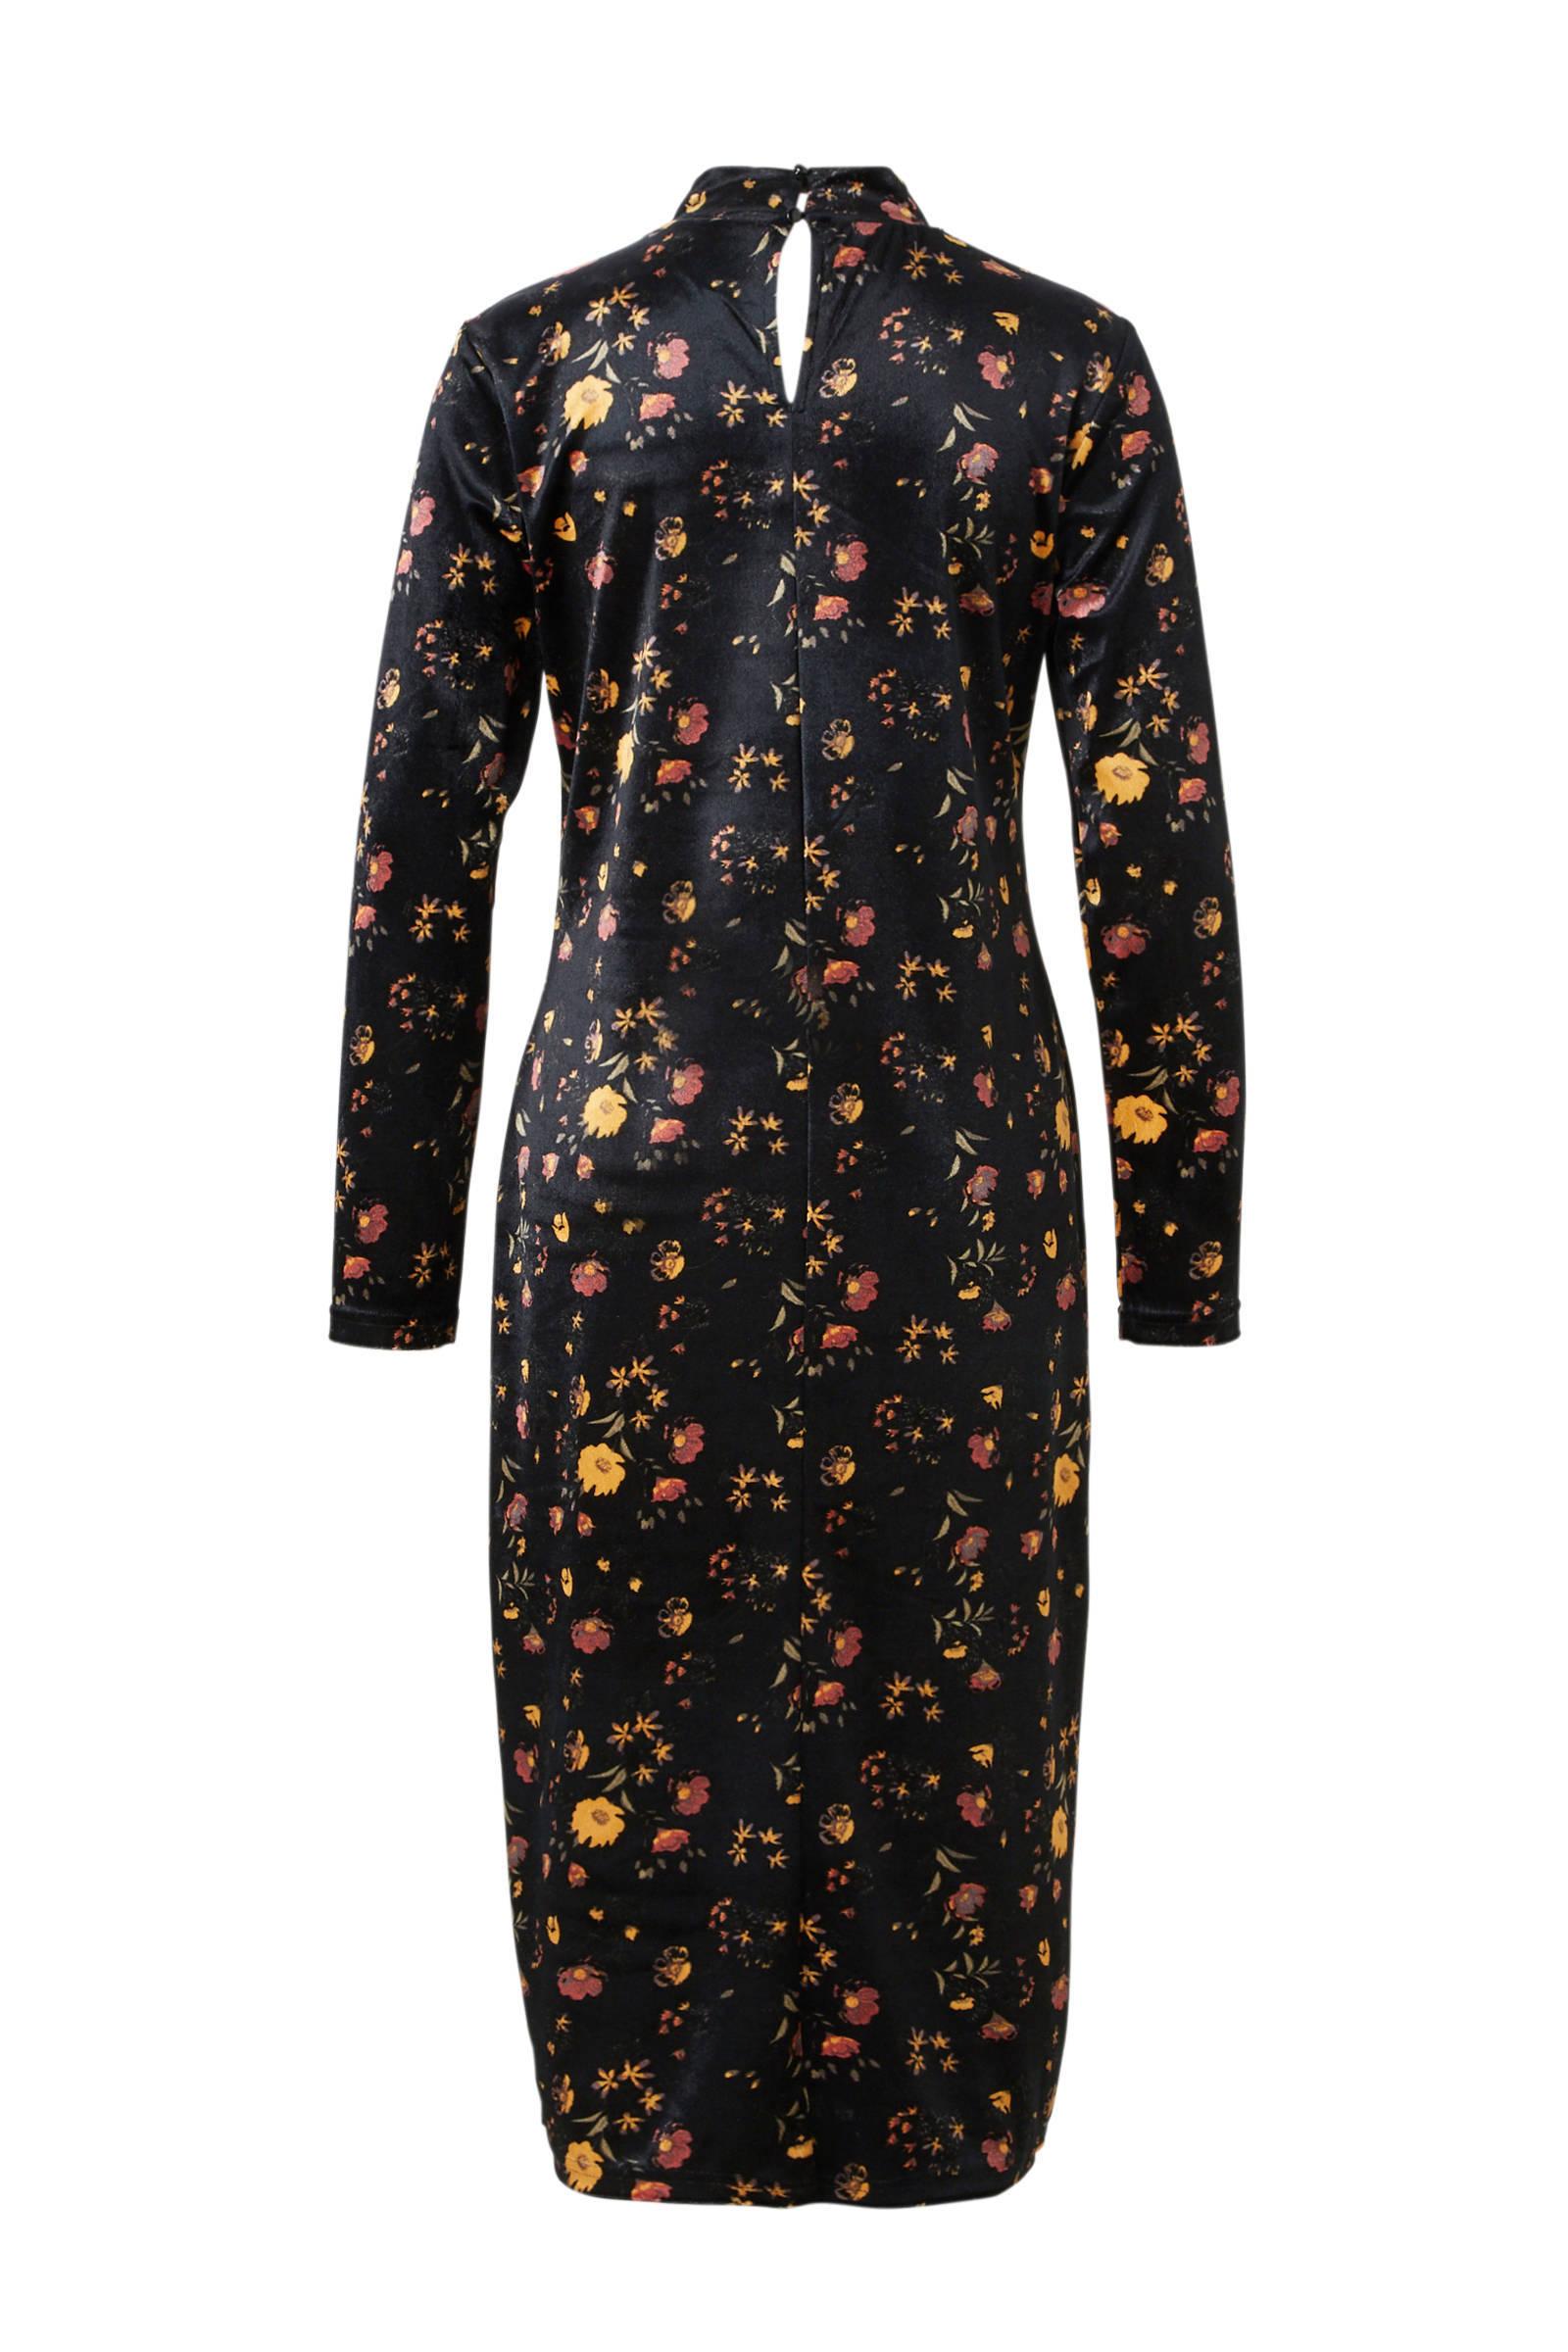 4f2daefaa86979 JACQUELINE DE YONG fluwelen jurk met bloemenprint